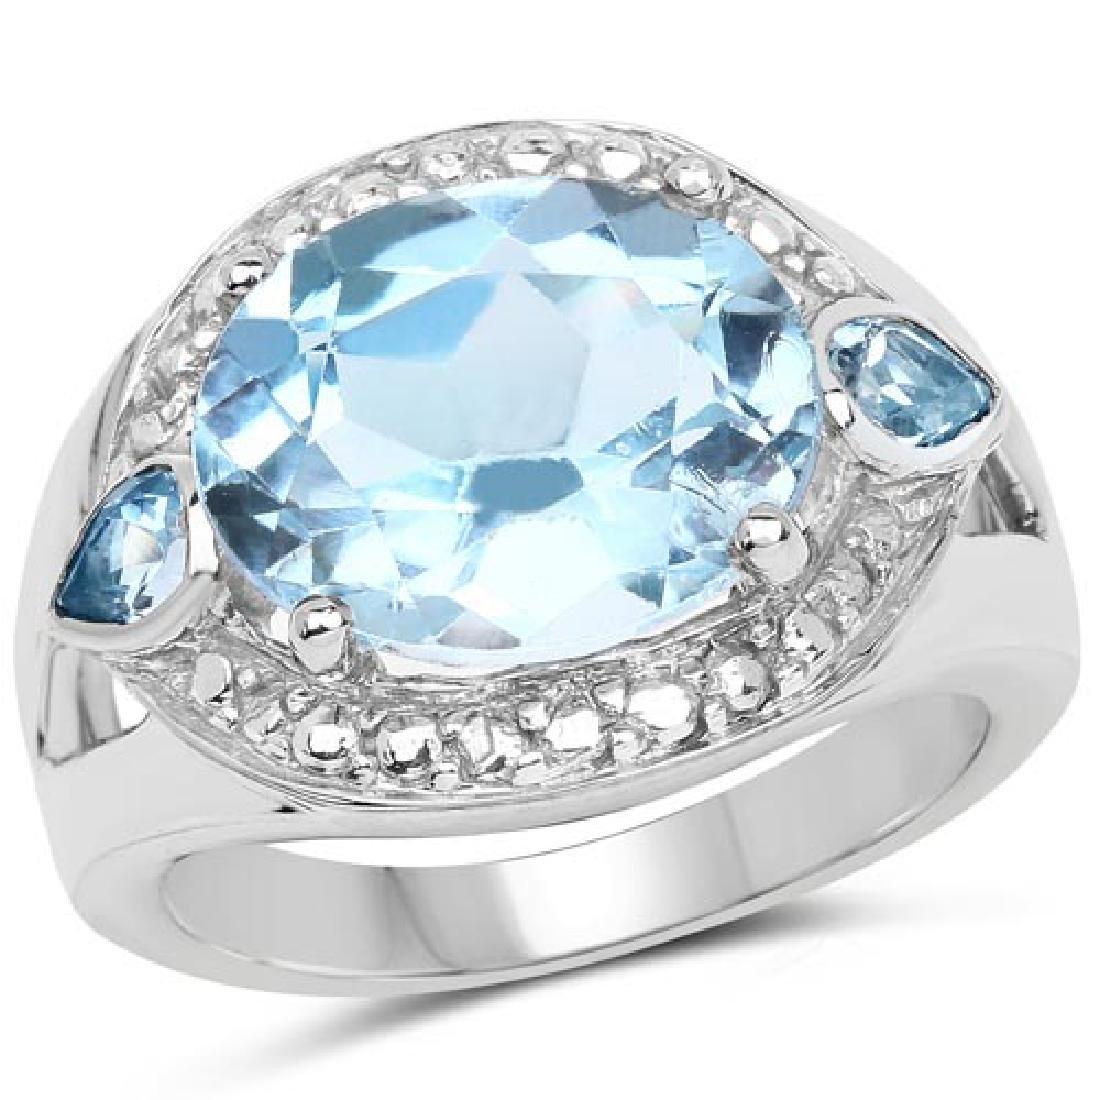 5.51 Carat Genuine Blue Topaz Brass Ring